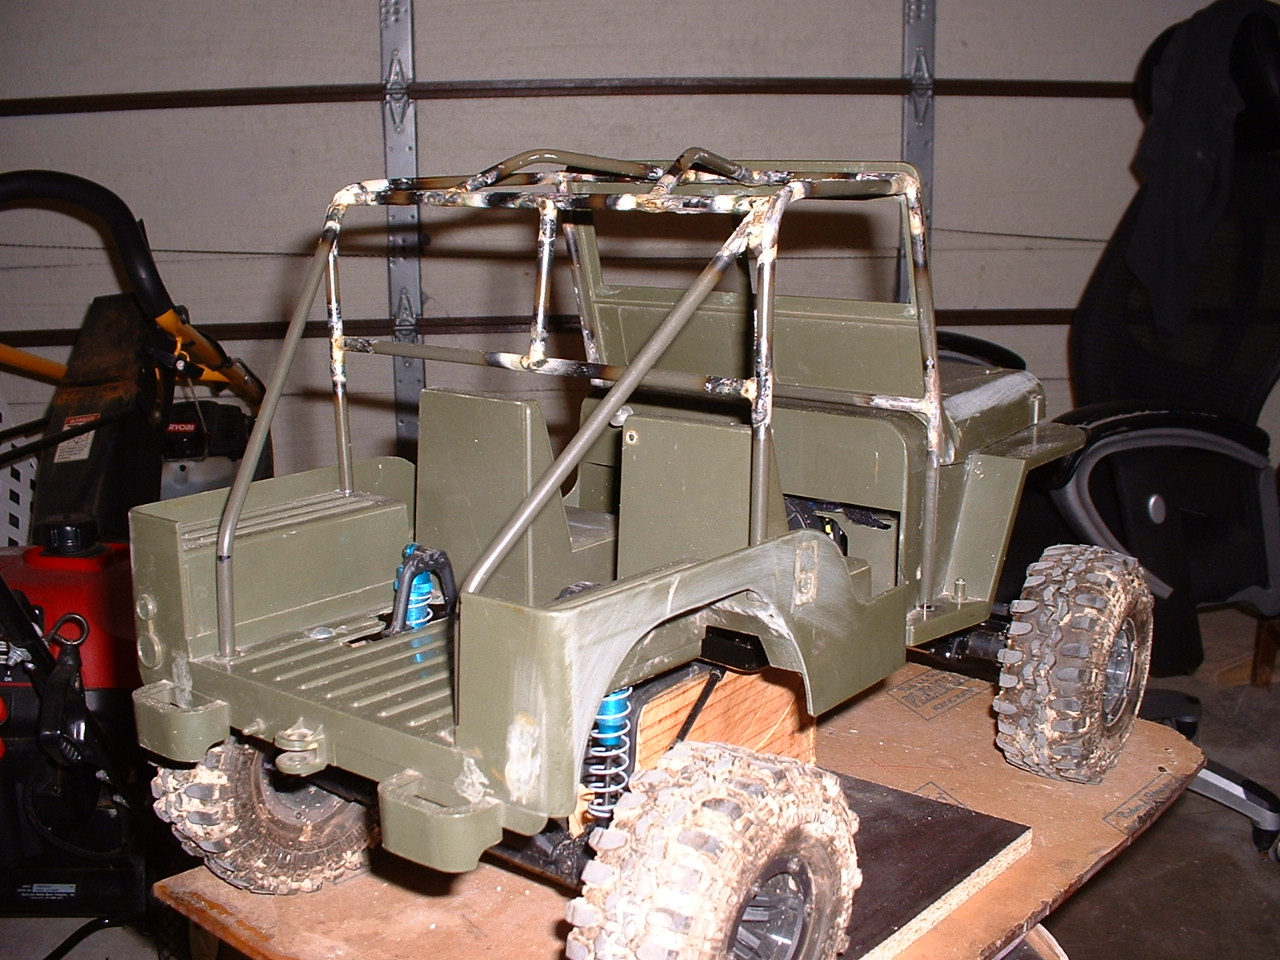 Click image for larger version  Name:GI Joe Jeep 5b 001.JPG Views:888 Size:329.3 KB ID:2040907